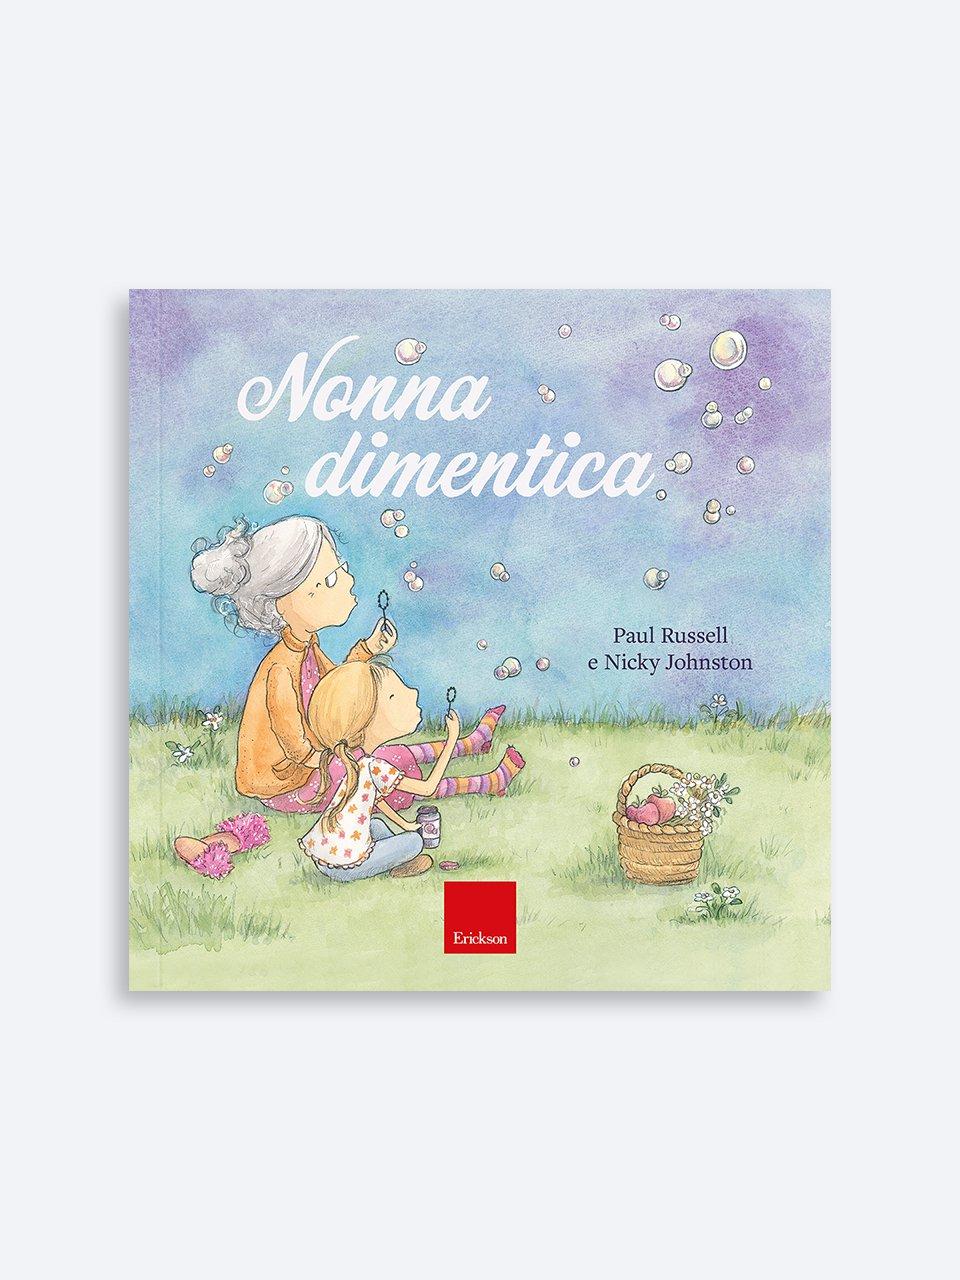 Nonna dimentica - Raccontare storie aiuta i bambini - Libri - Erickson